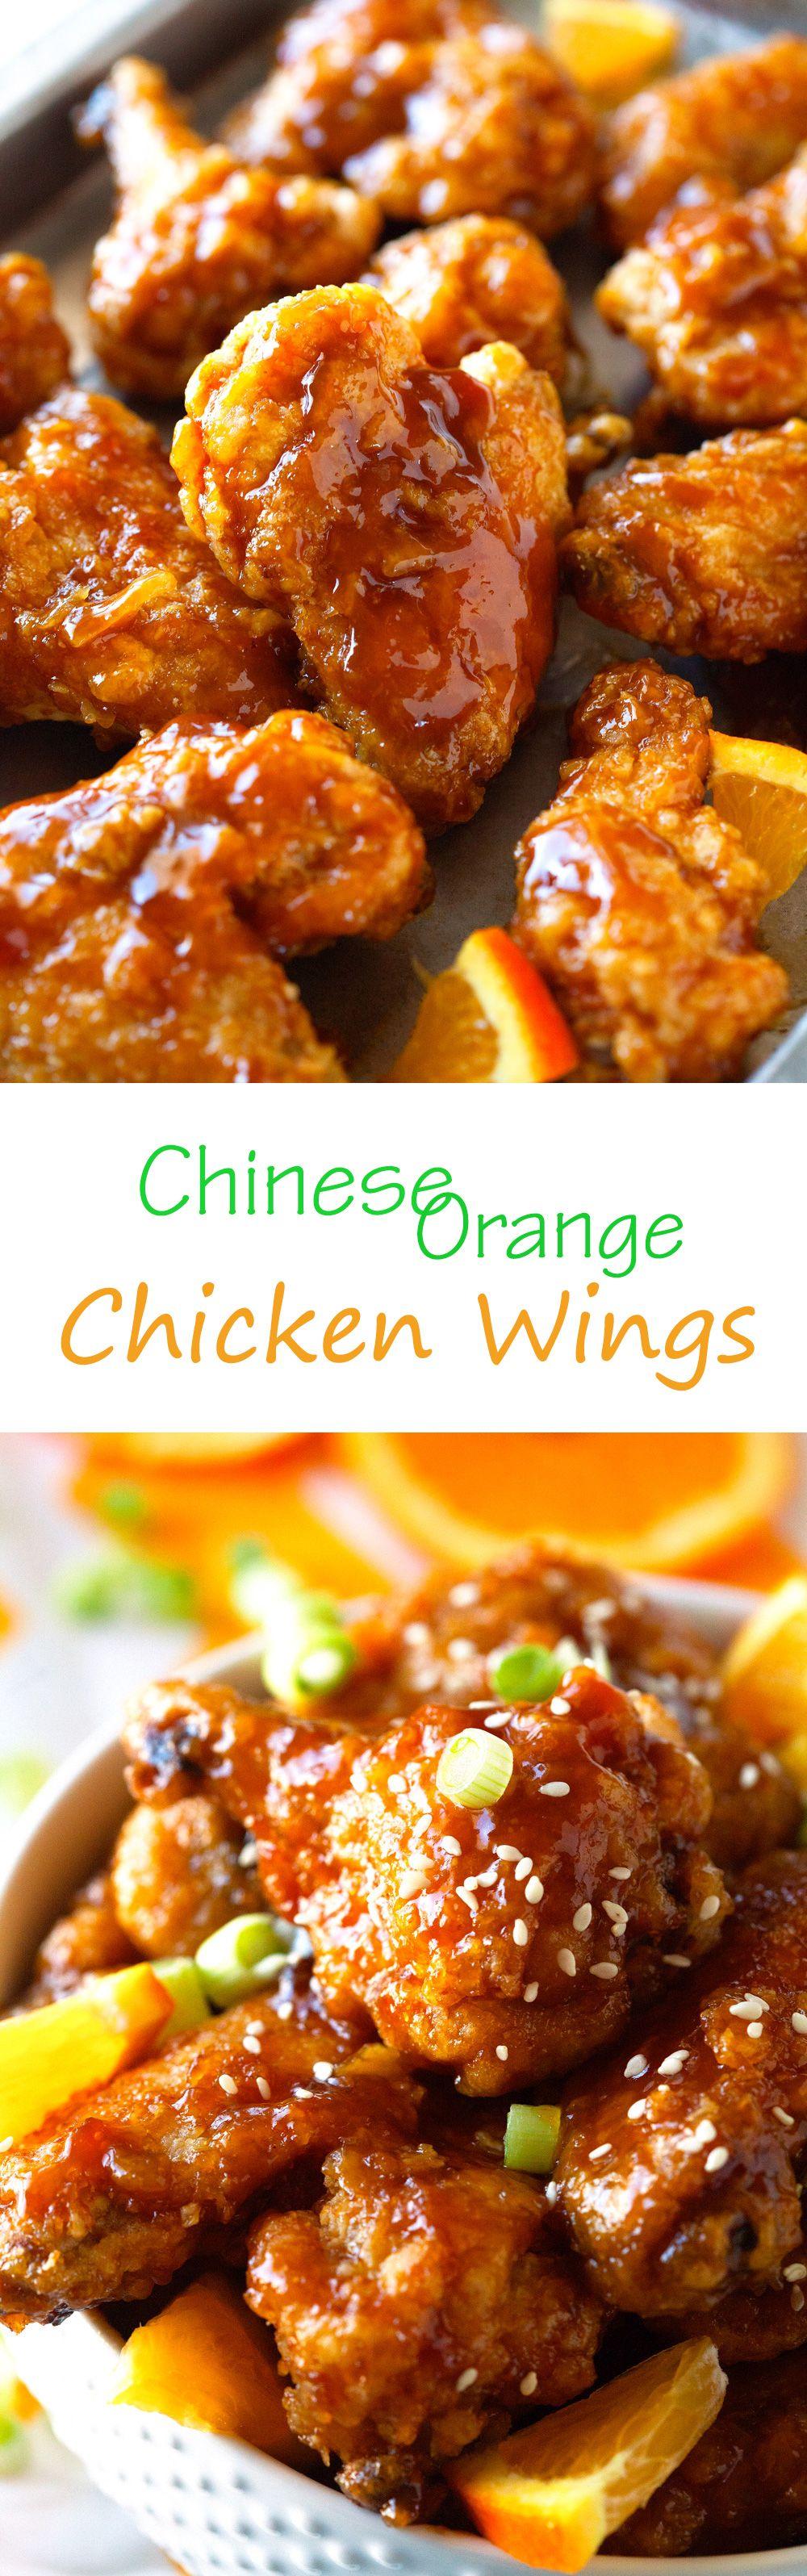 Chinese orange chicken wings recipe chinese dishes